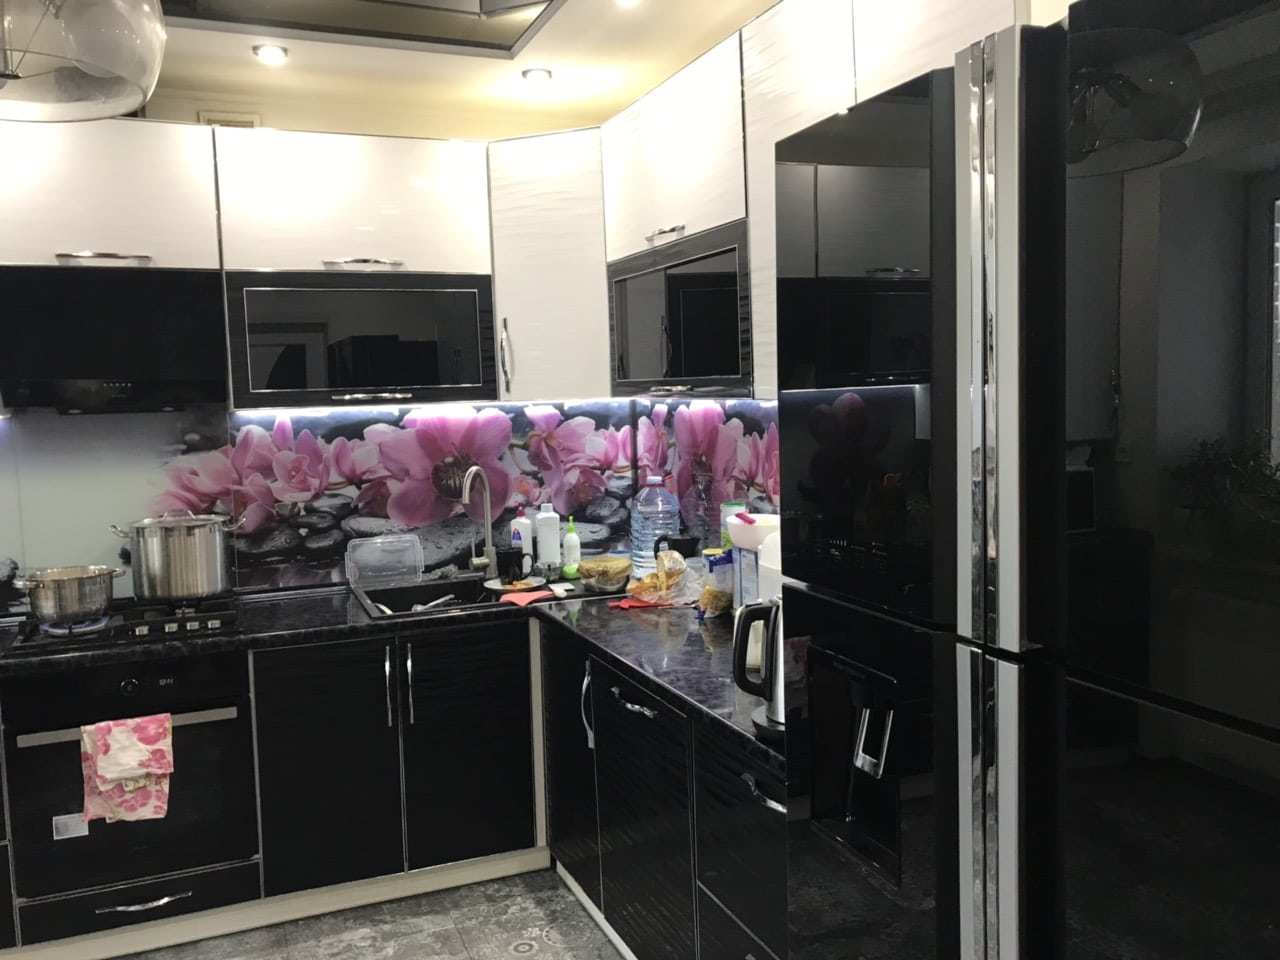 R-W660puc7GBK_int6 Холодильник для кухни-студии, дизайн.